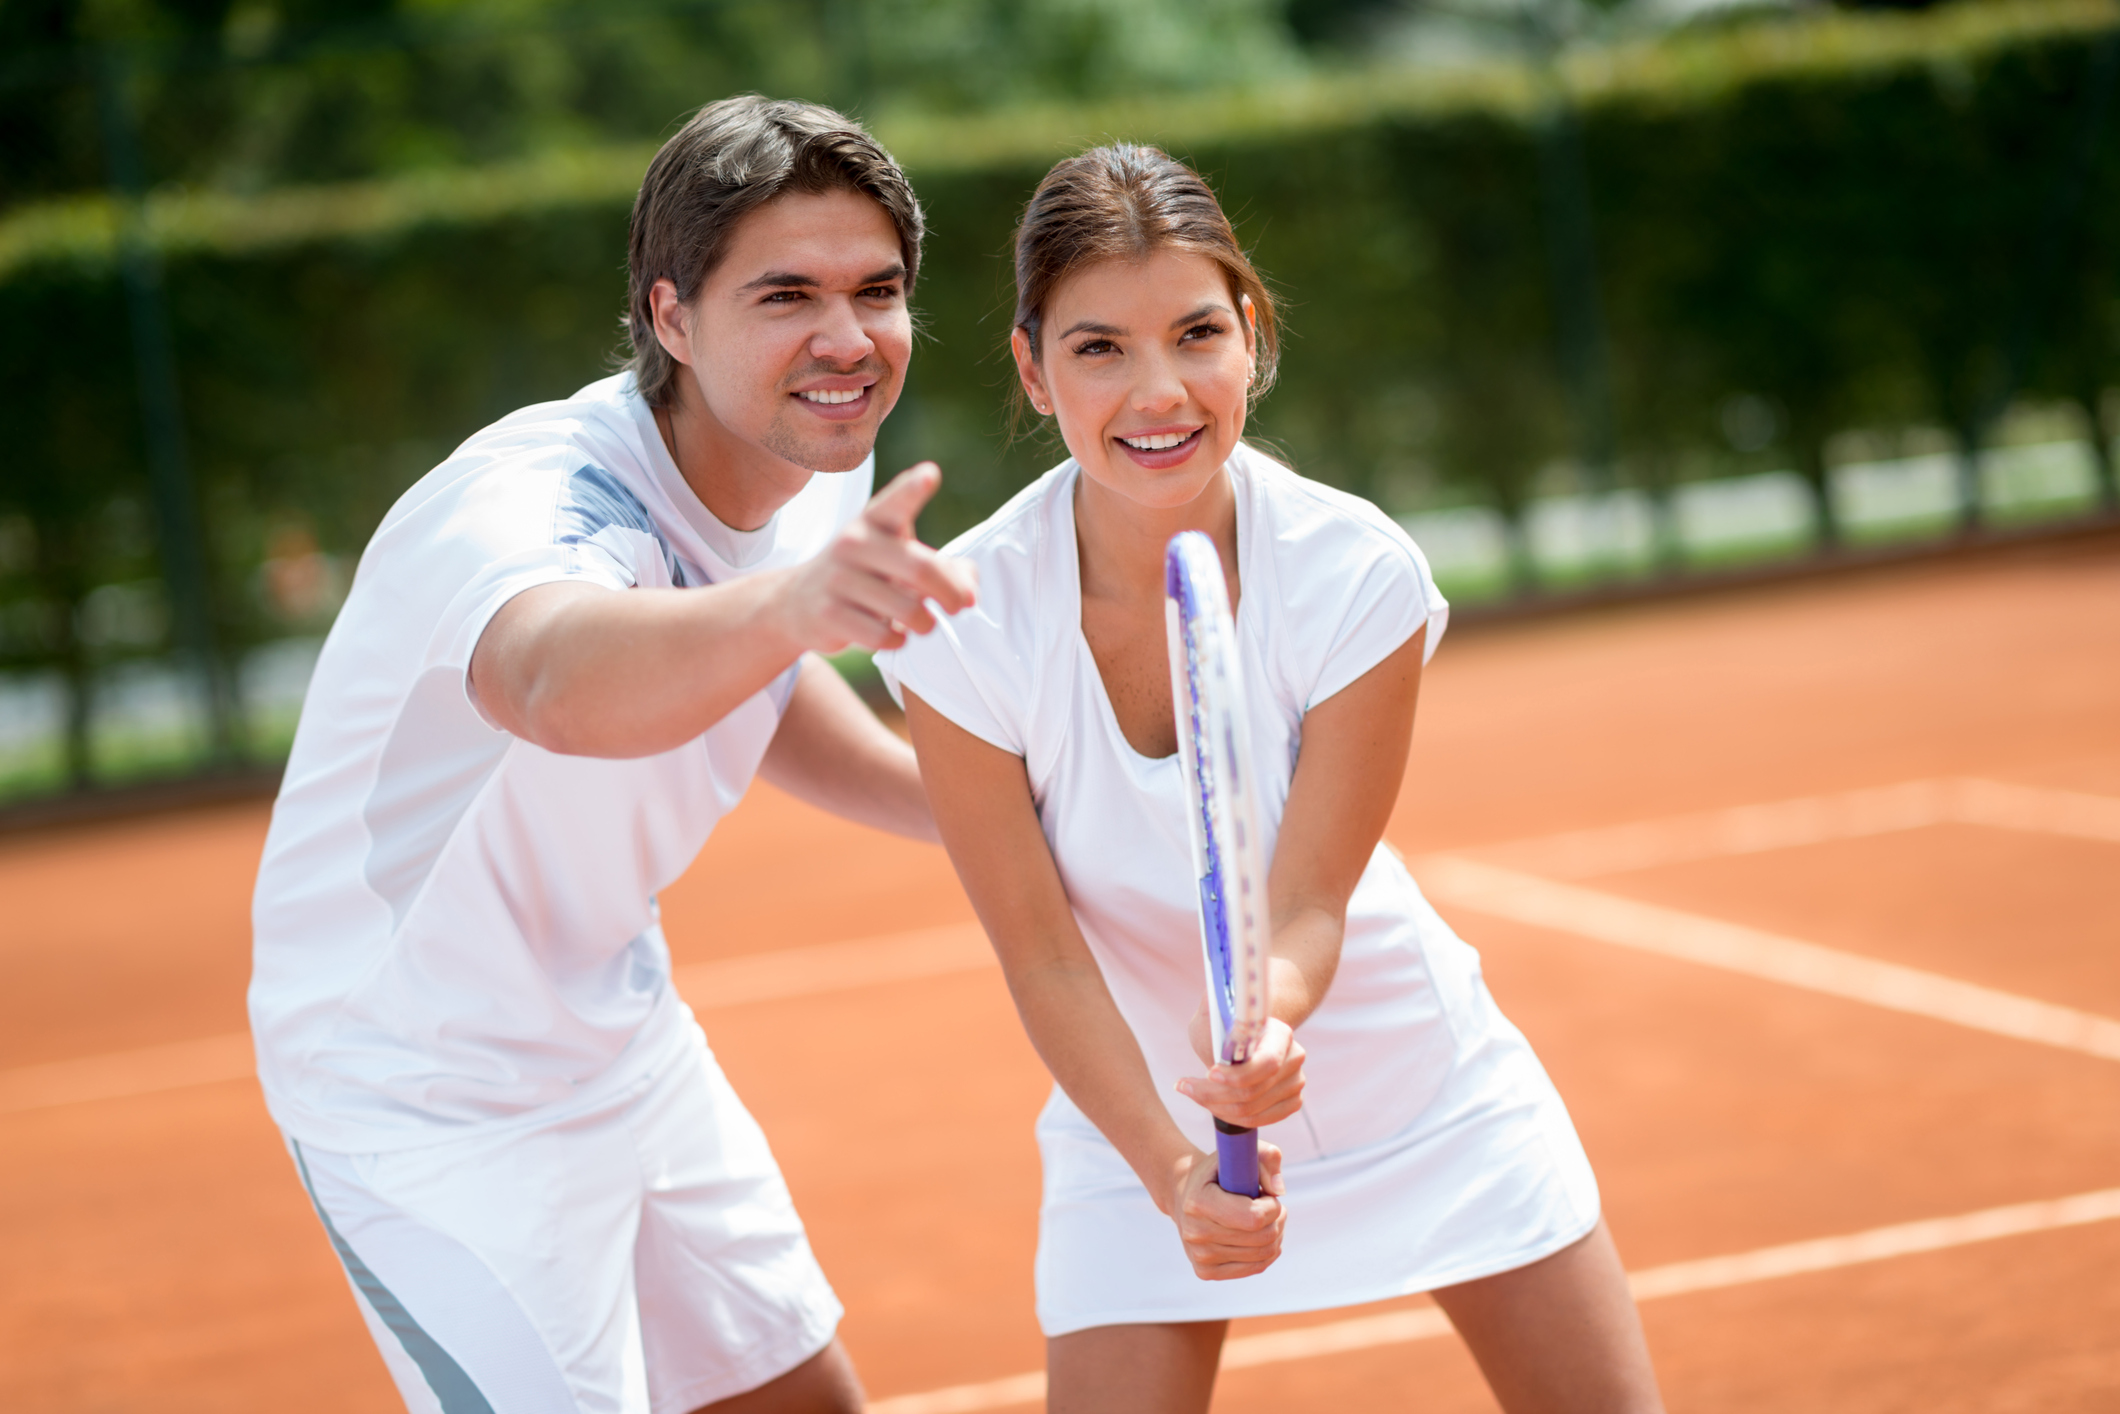 Tennis Costumes Lovetoknow